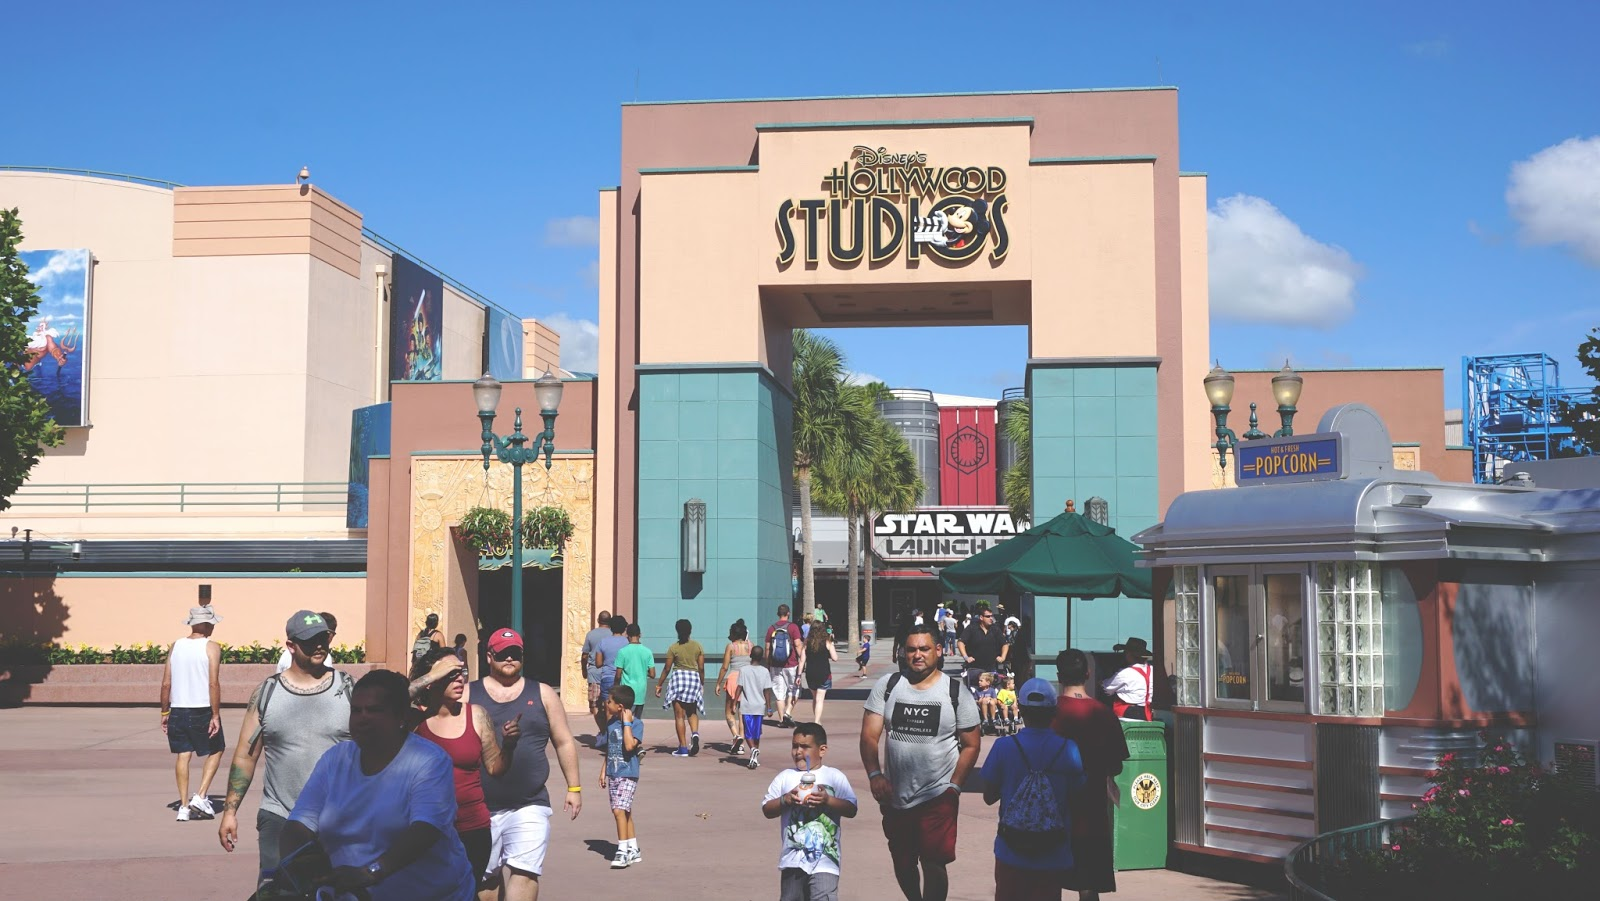 Hollywood Studios in Disney World, Florida